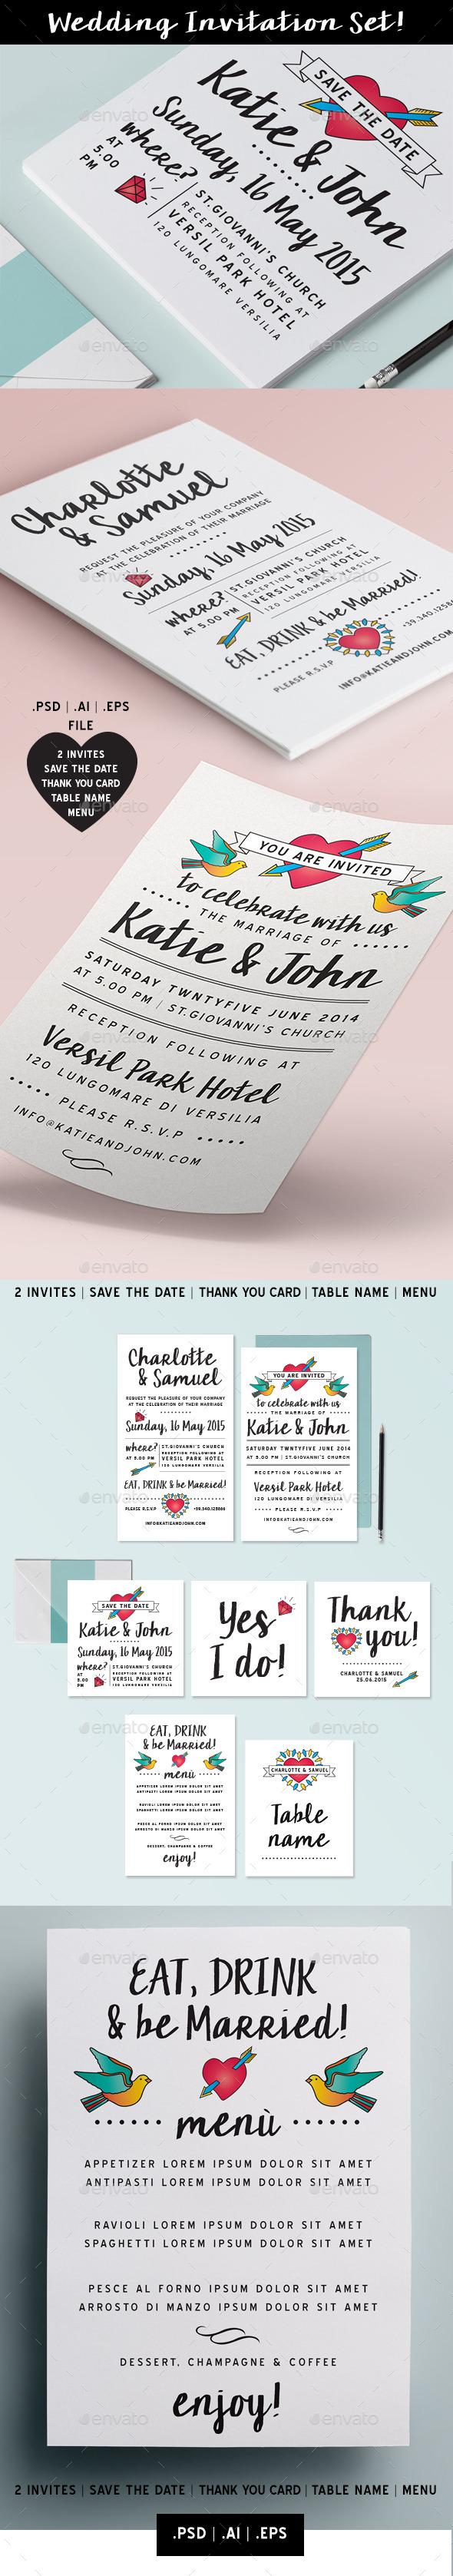 Wedding invitation Set vol. 6